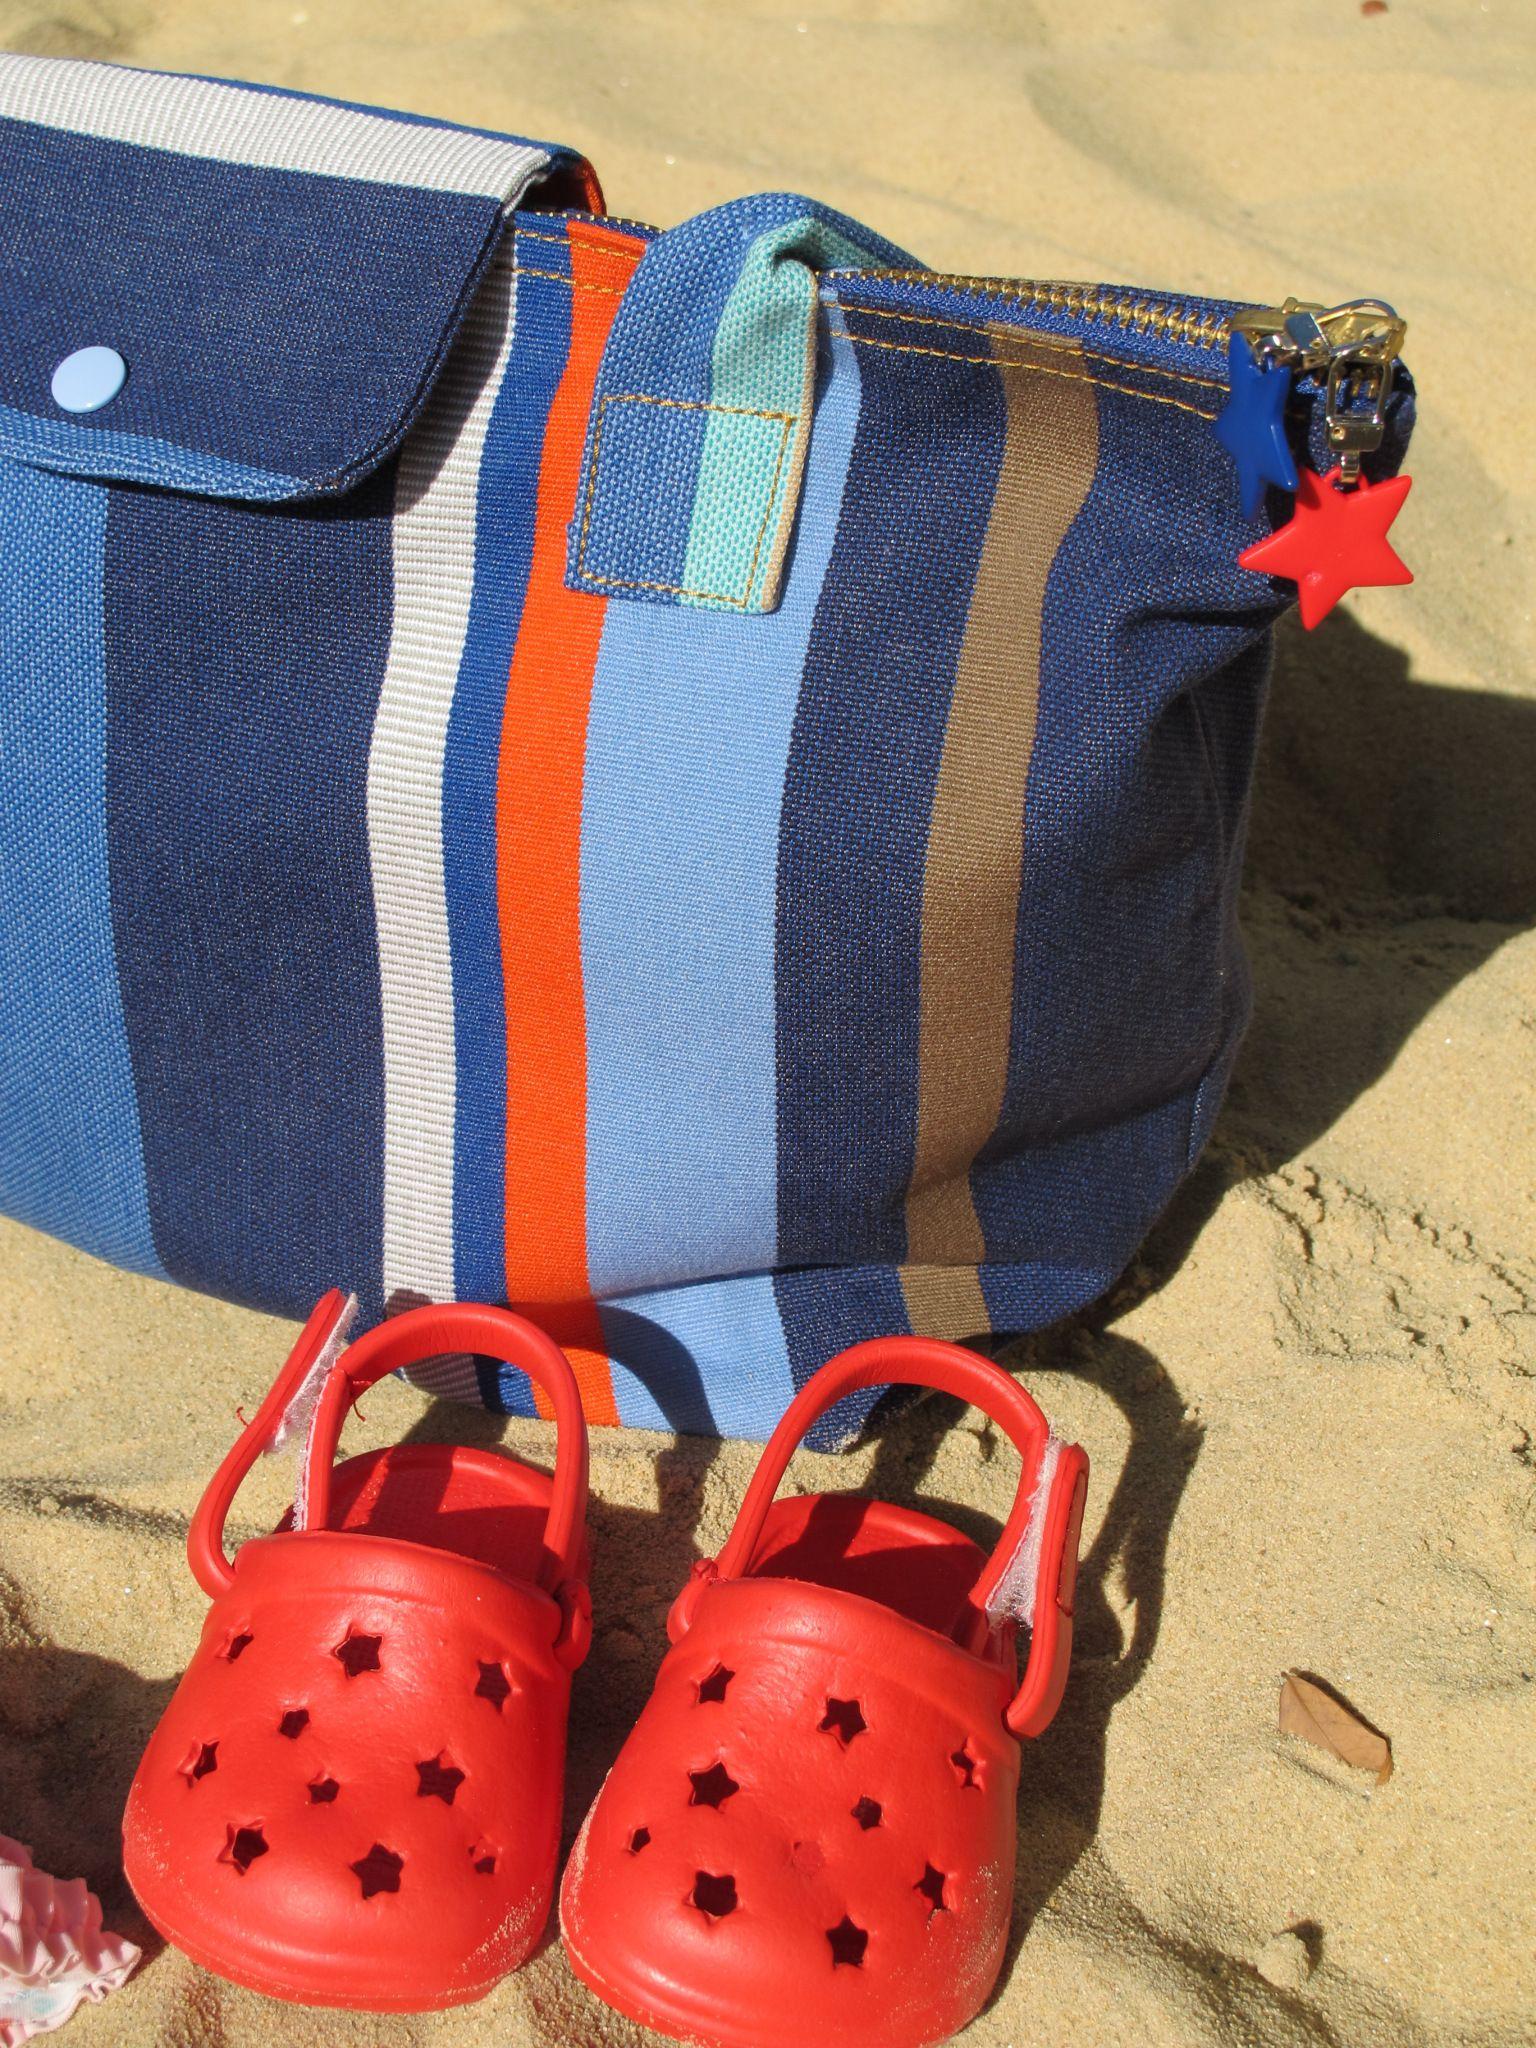 tuto diy le sac de plage fa on pliage de longchamp. Black Bedroom Furniture Sets. Home Design Ideas